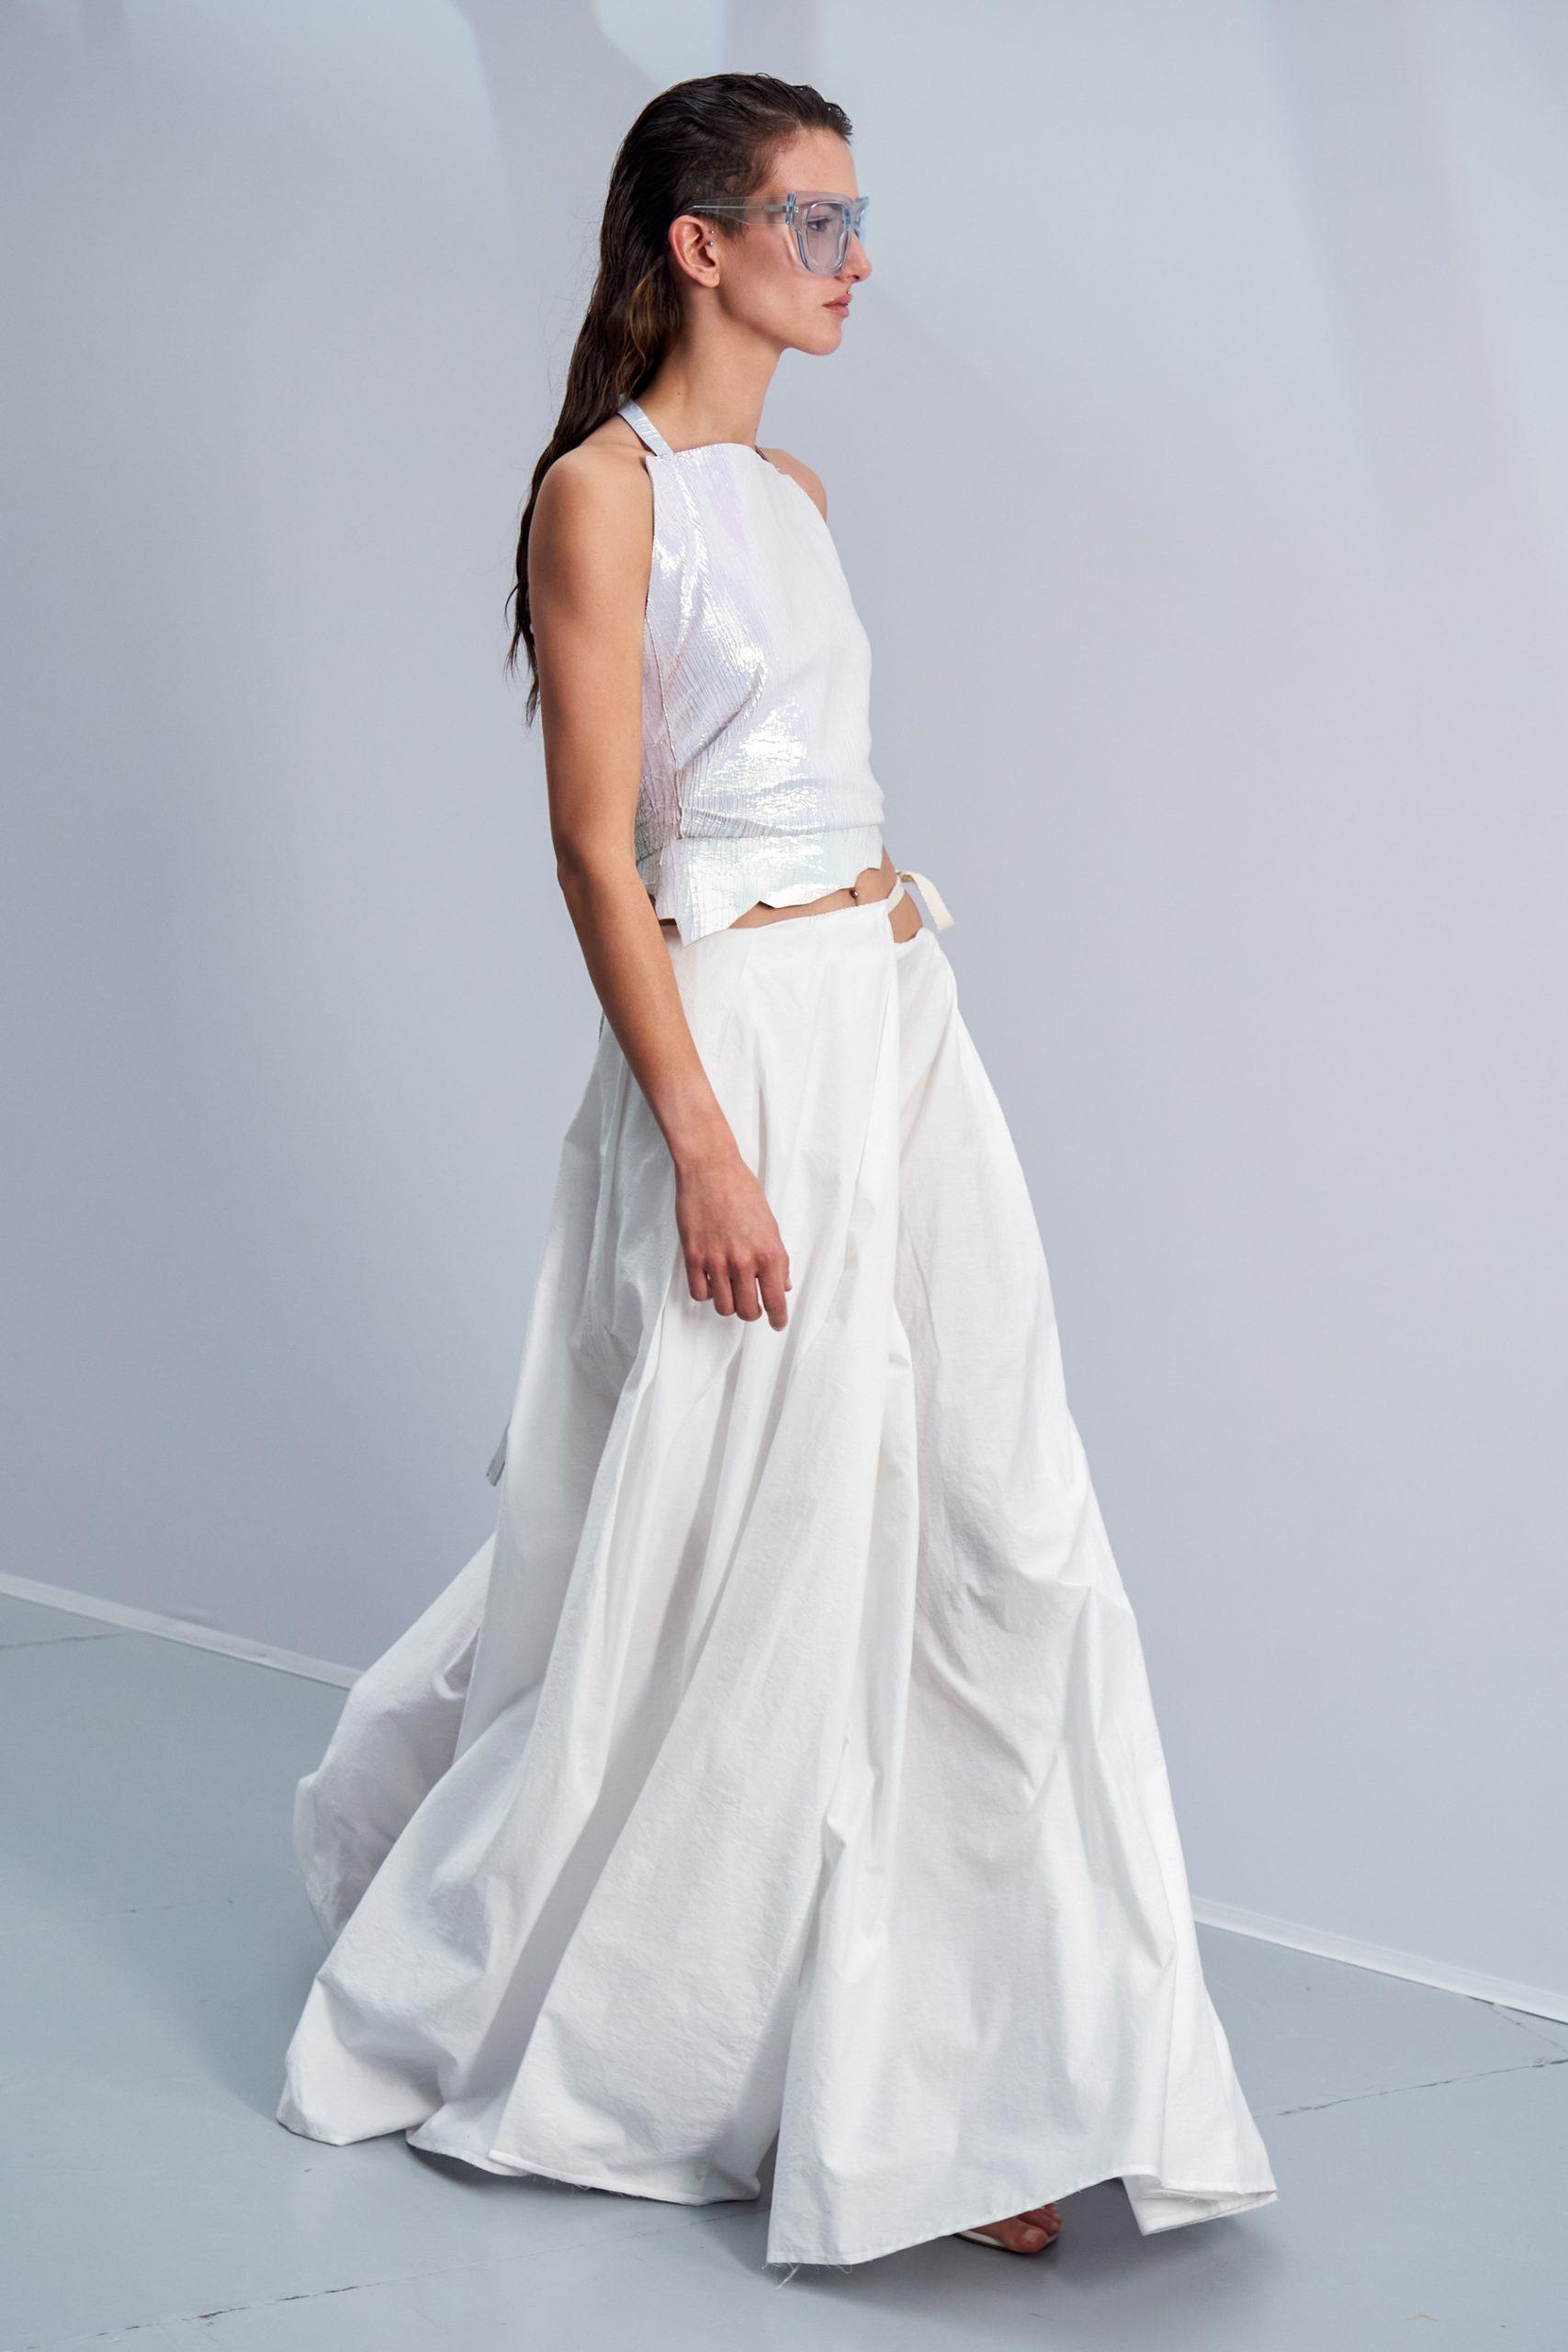 Acne Studios Spring 2021 Fashion Show Film